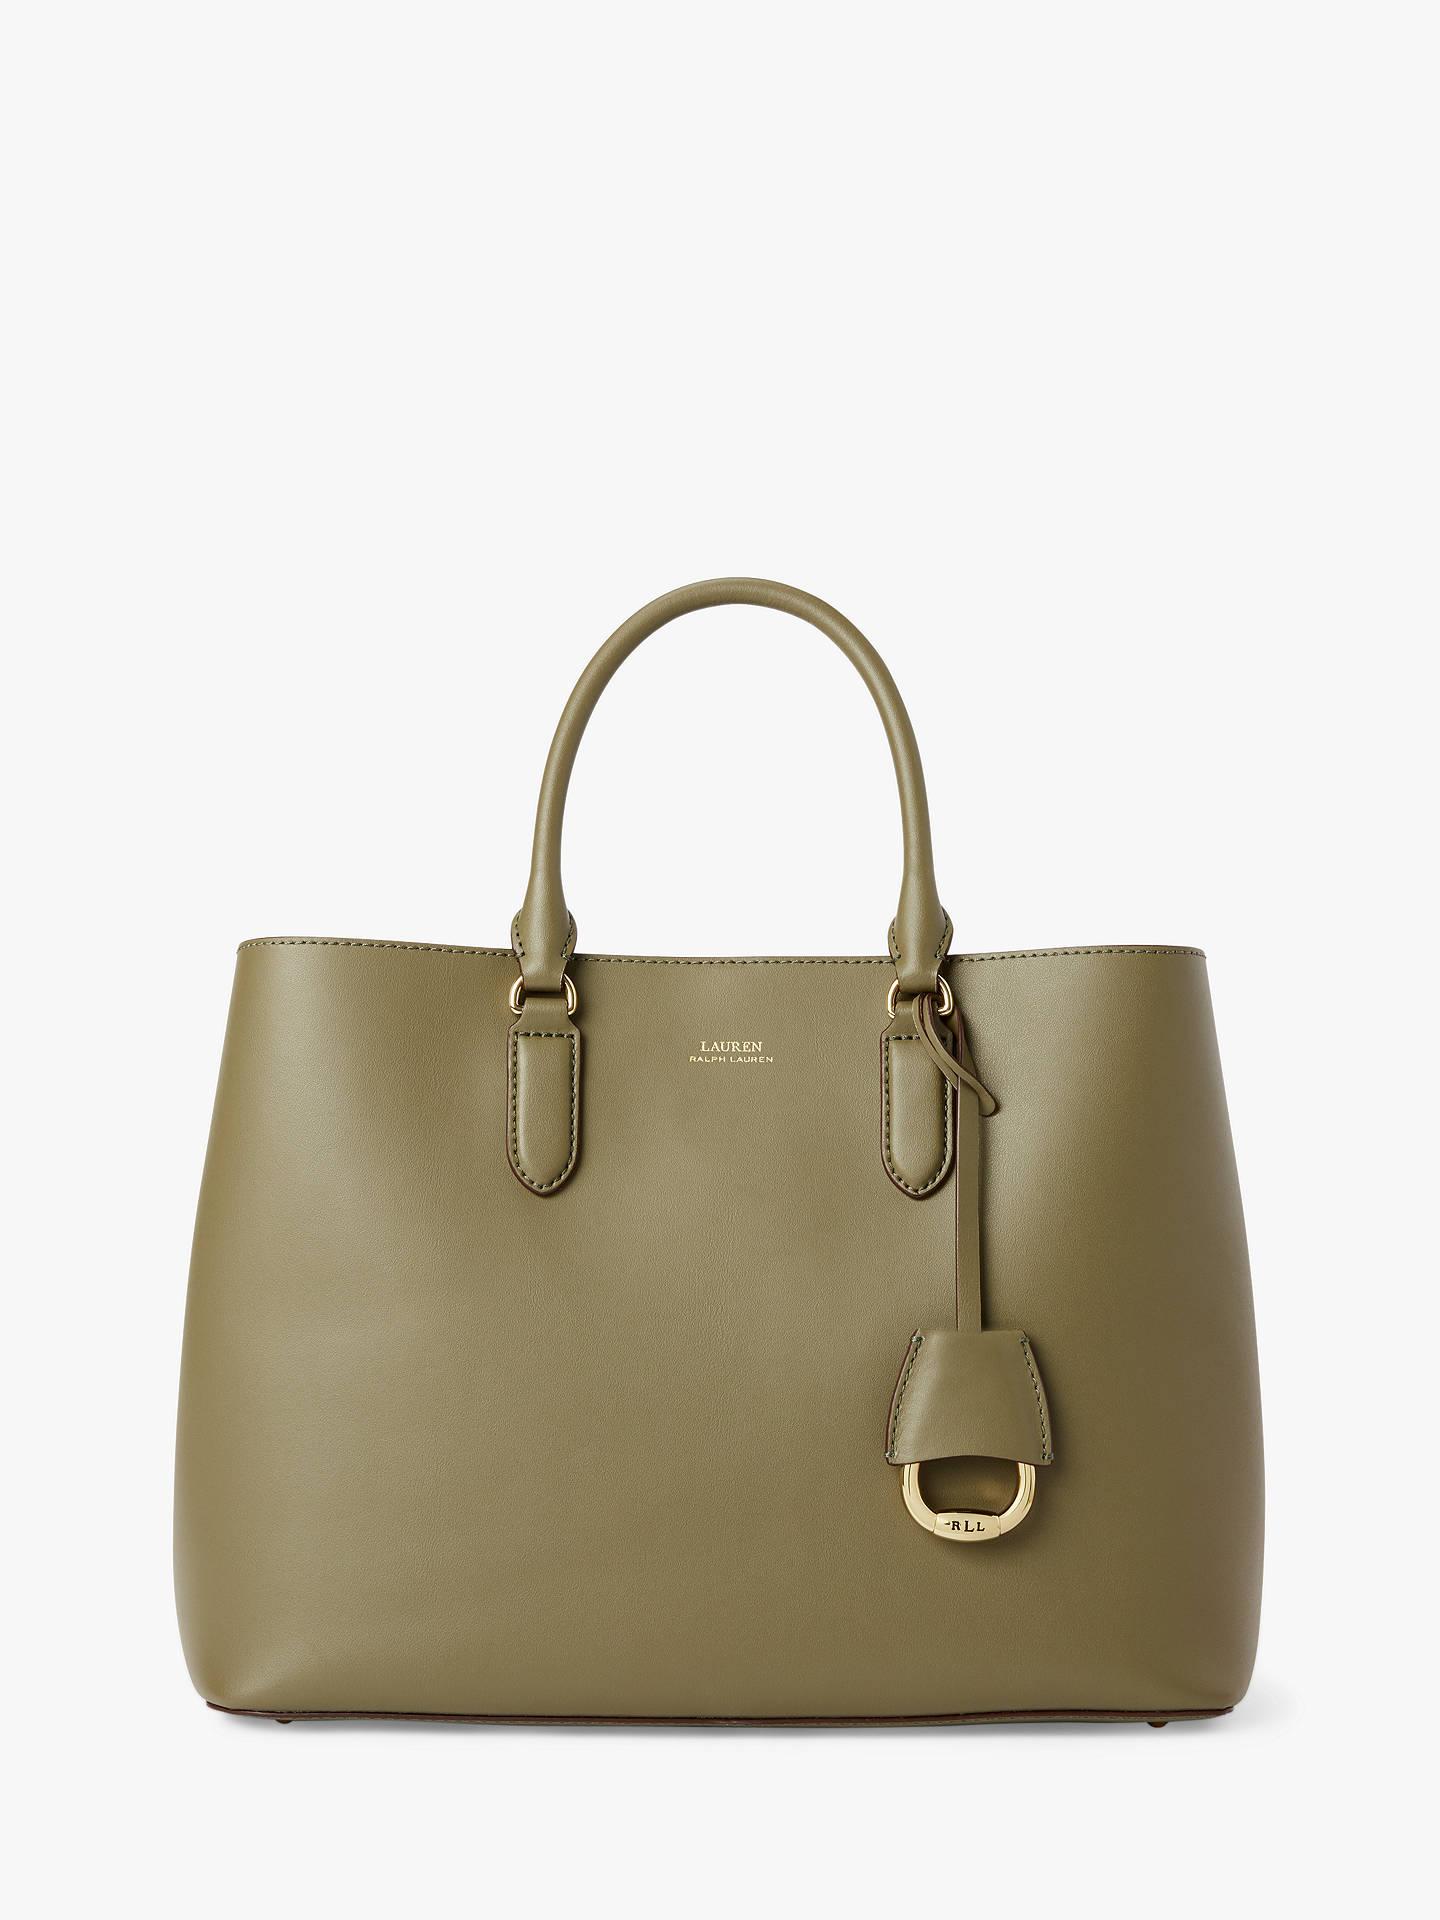 bafbaeaddd Lauren Ralph Lauren Dryden Marcy Leather Satchel Bag, Sage/Vanilla